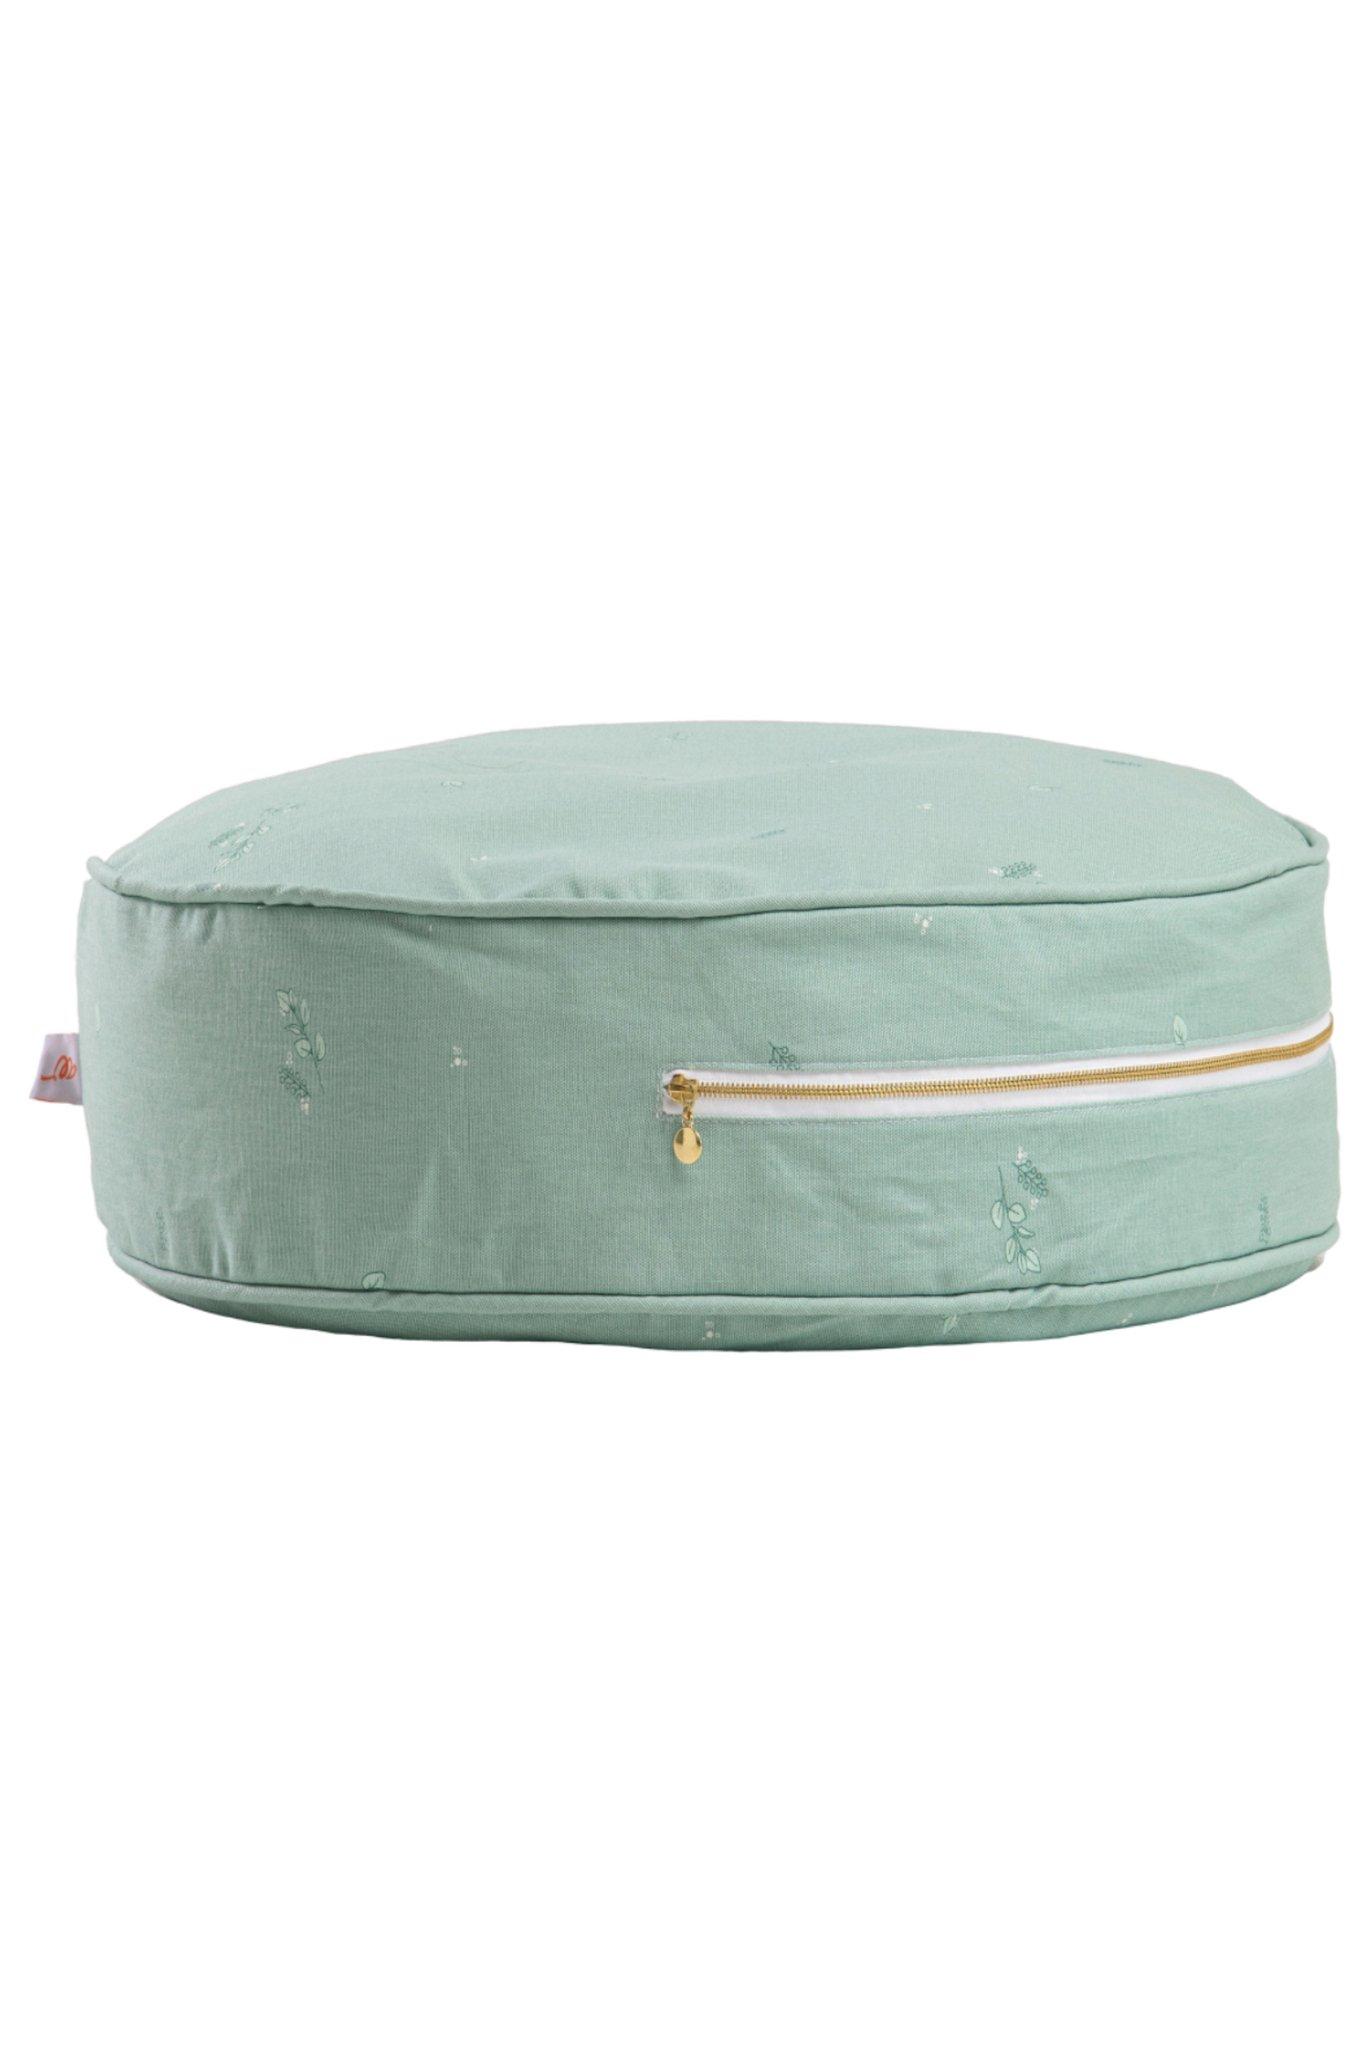 rundes Sitzkissen Ottomane mintgrün